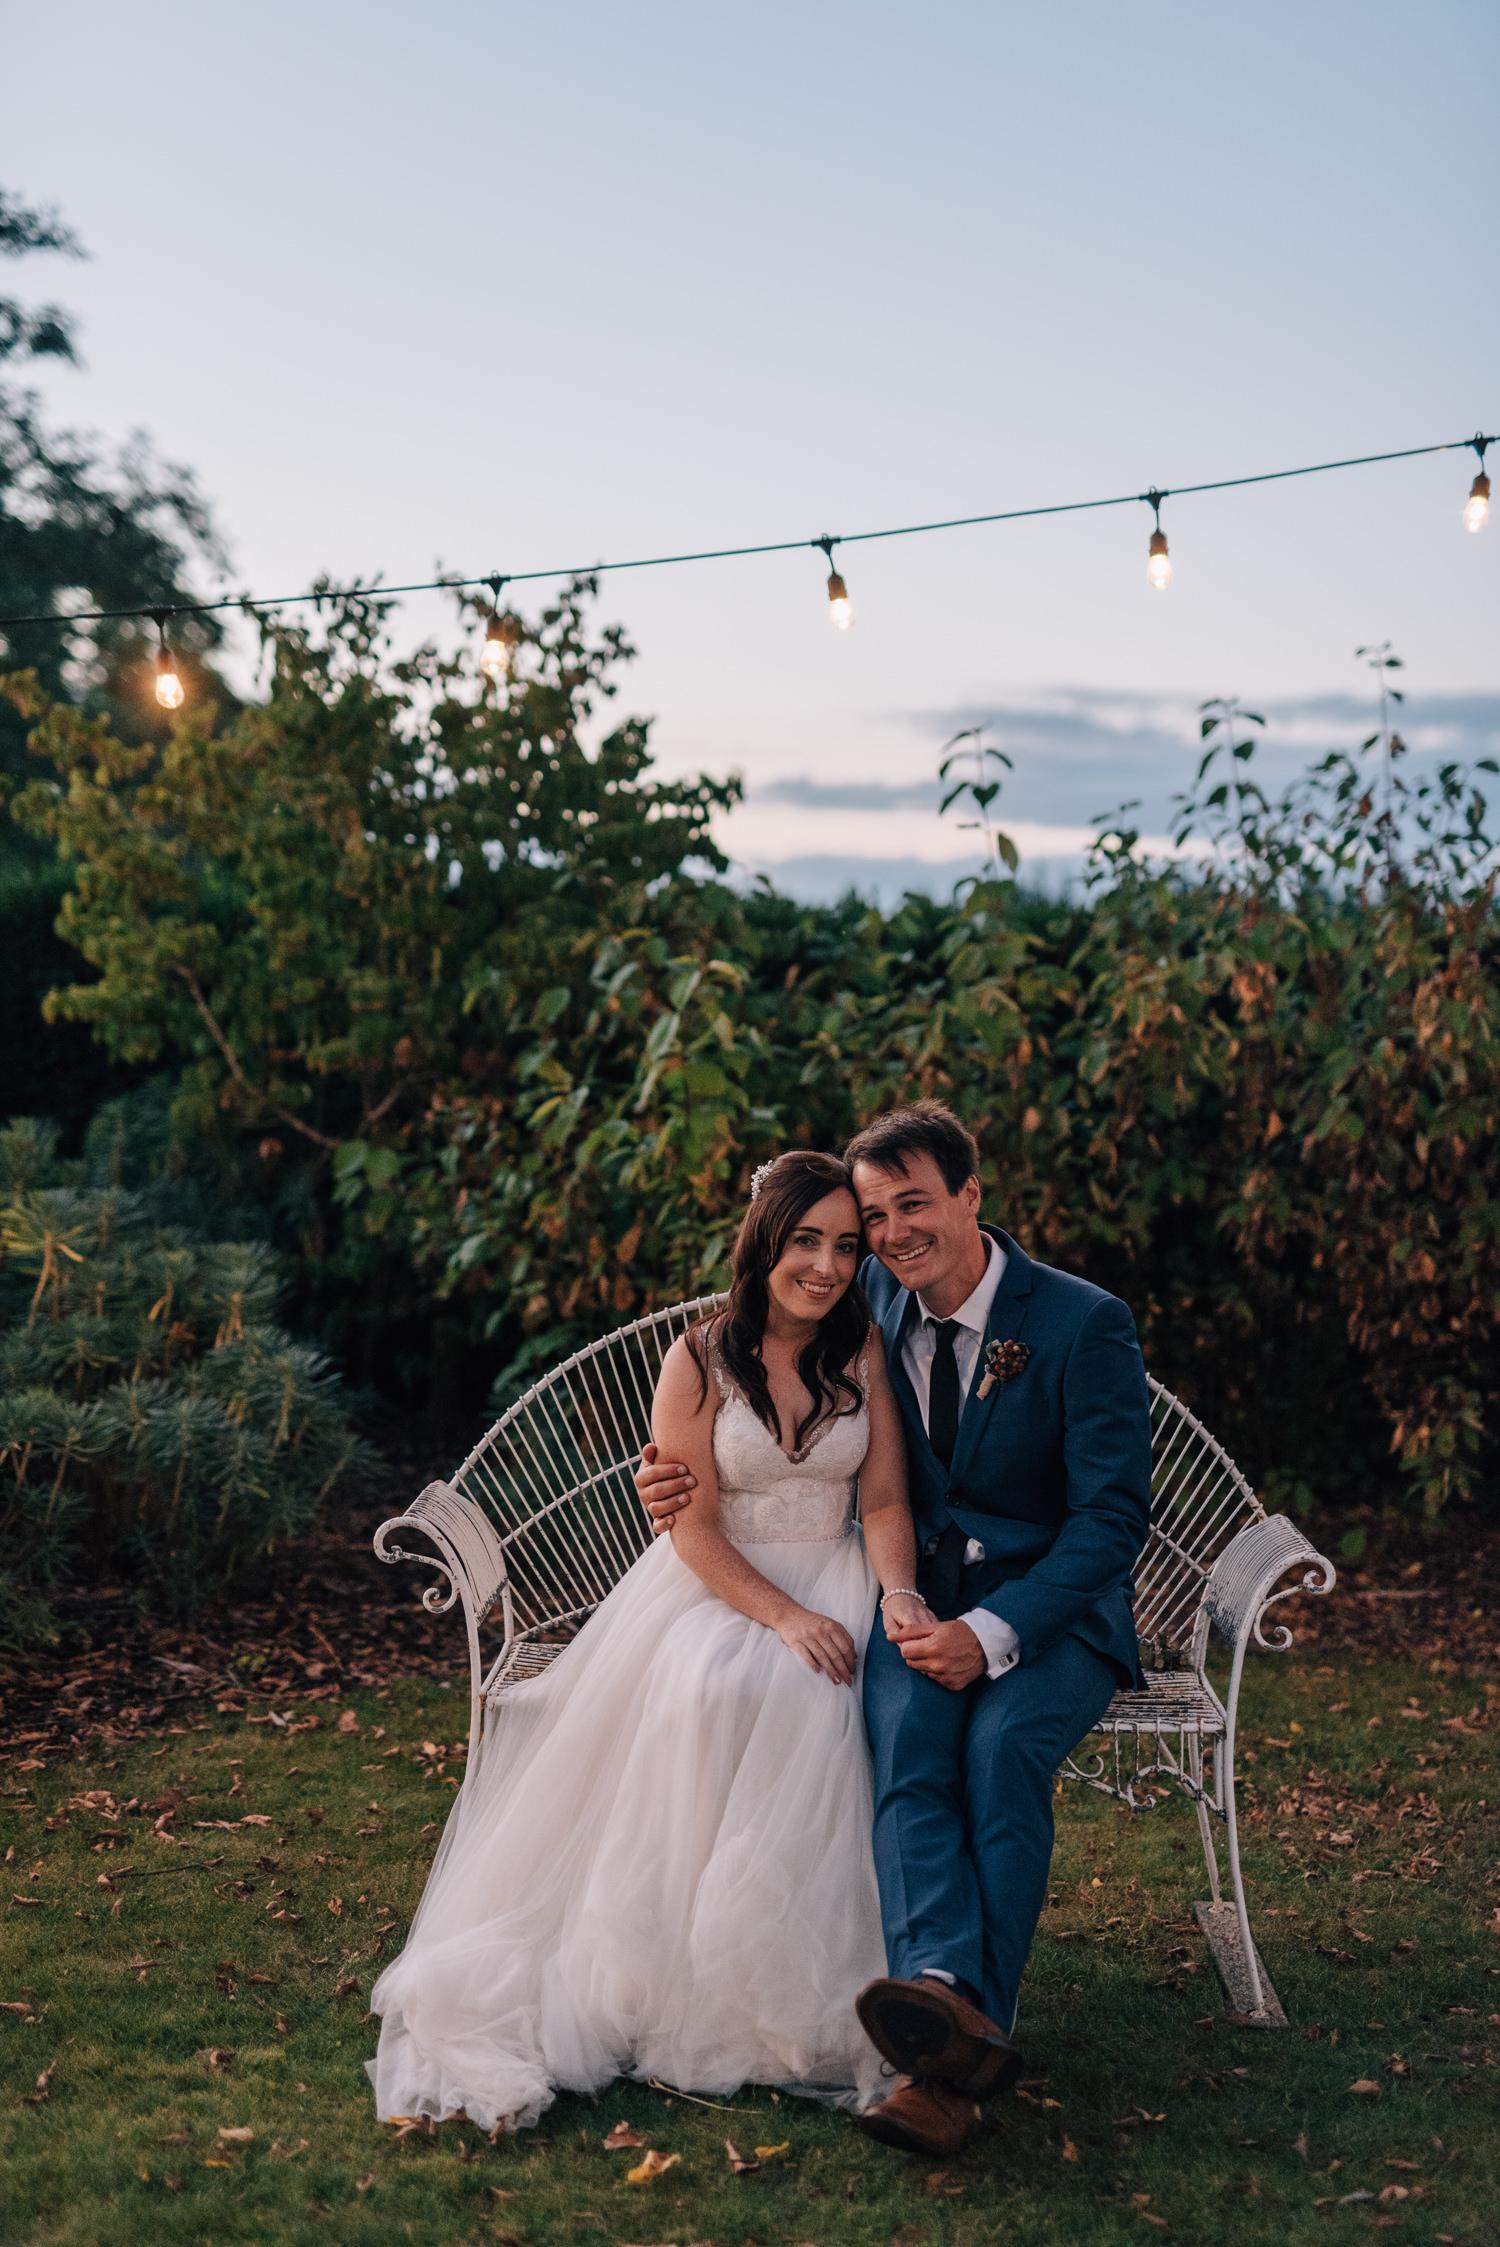 Quamby-Wedding-Photographer-158.jpg